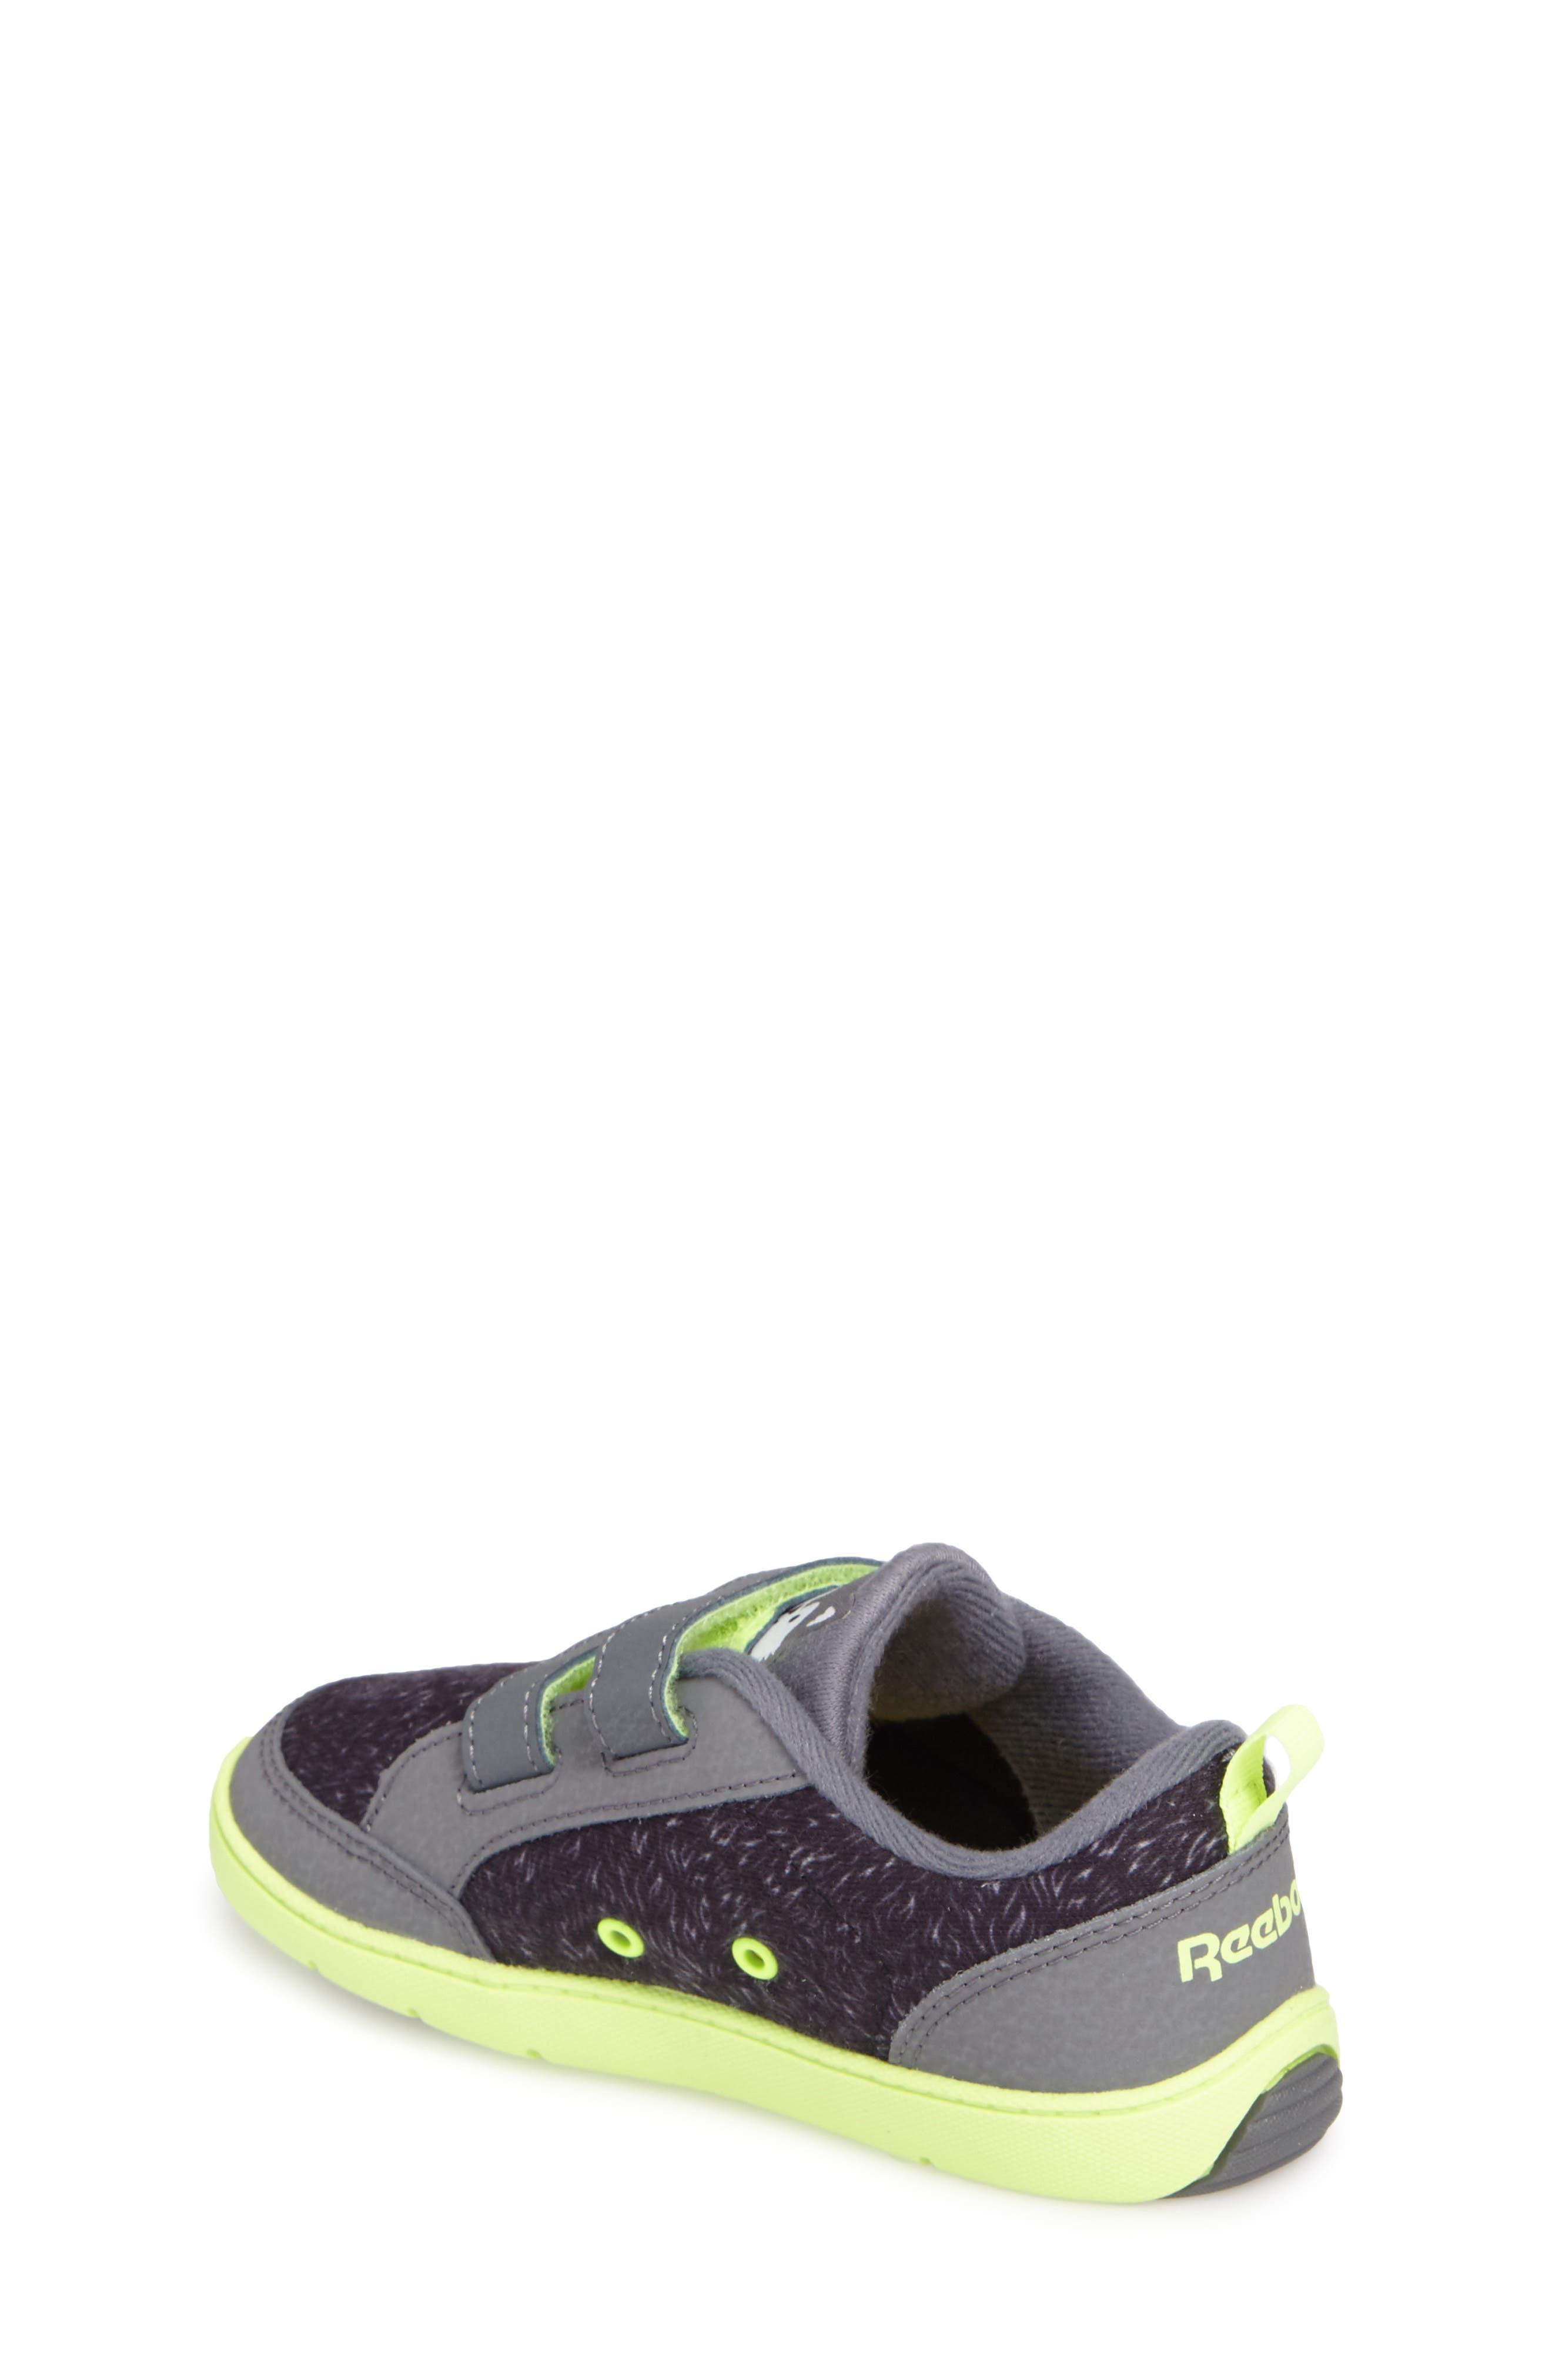 Alternate Image 2  - Reebok Ventureflex Critter Feet Sneaker (Baby, Walker & Toddler)